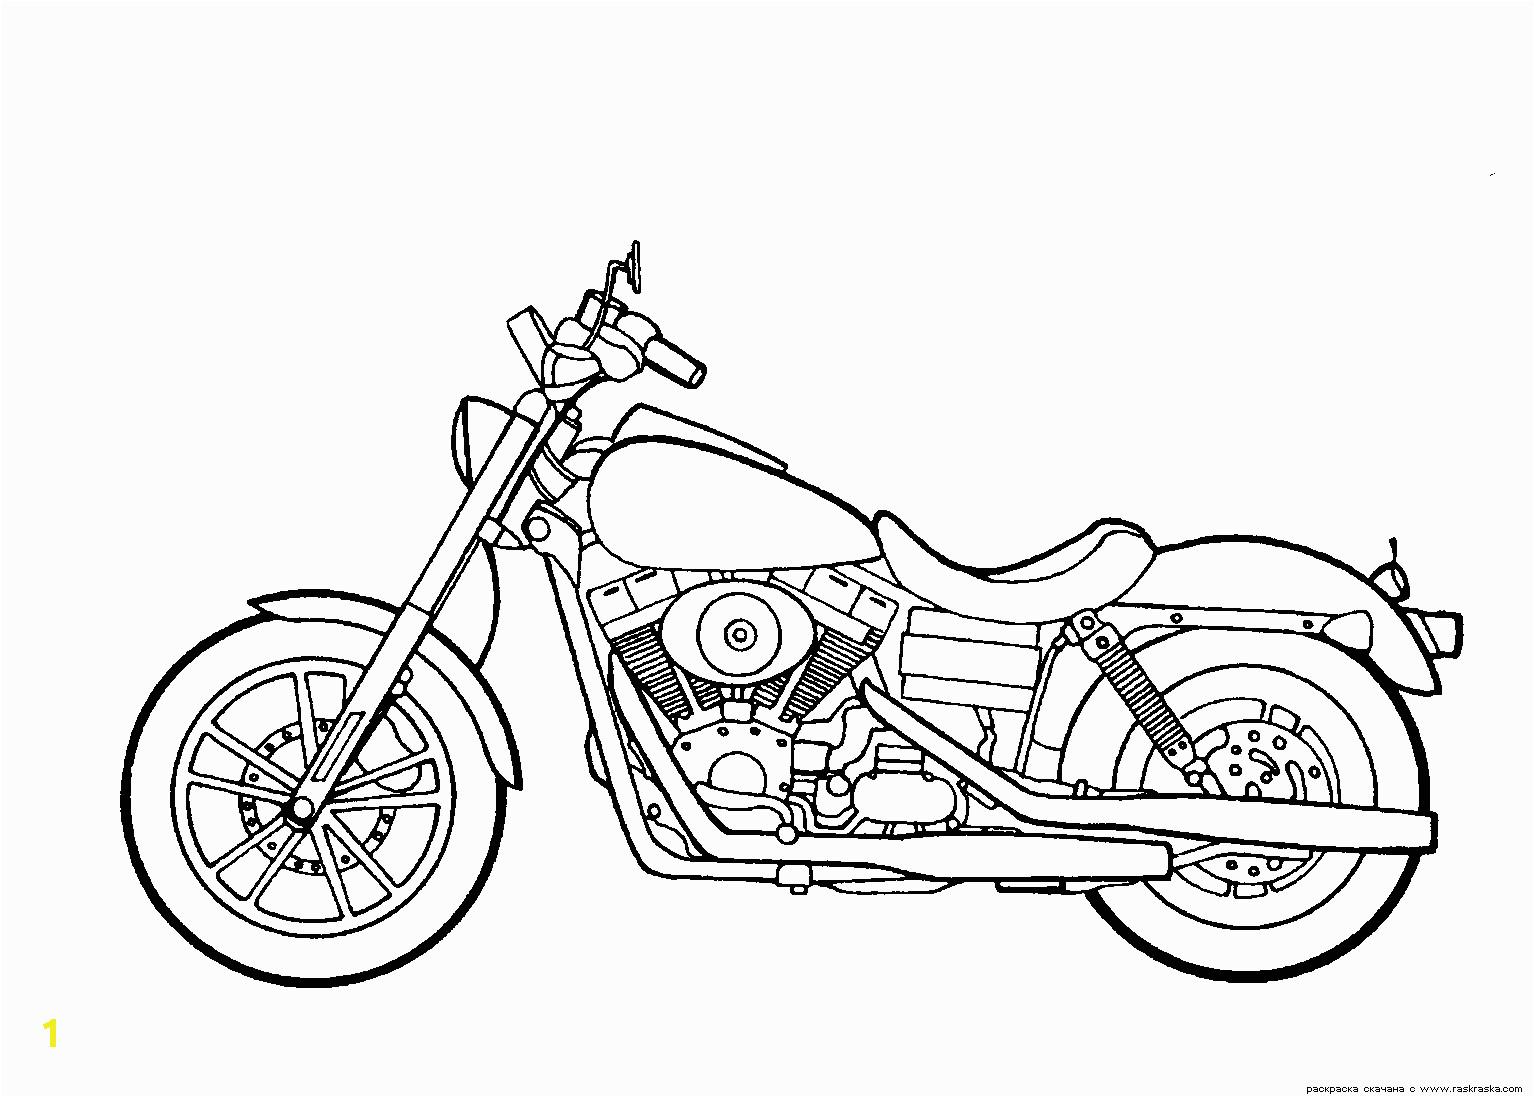 harley davidson logo coloring pages